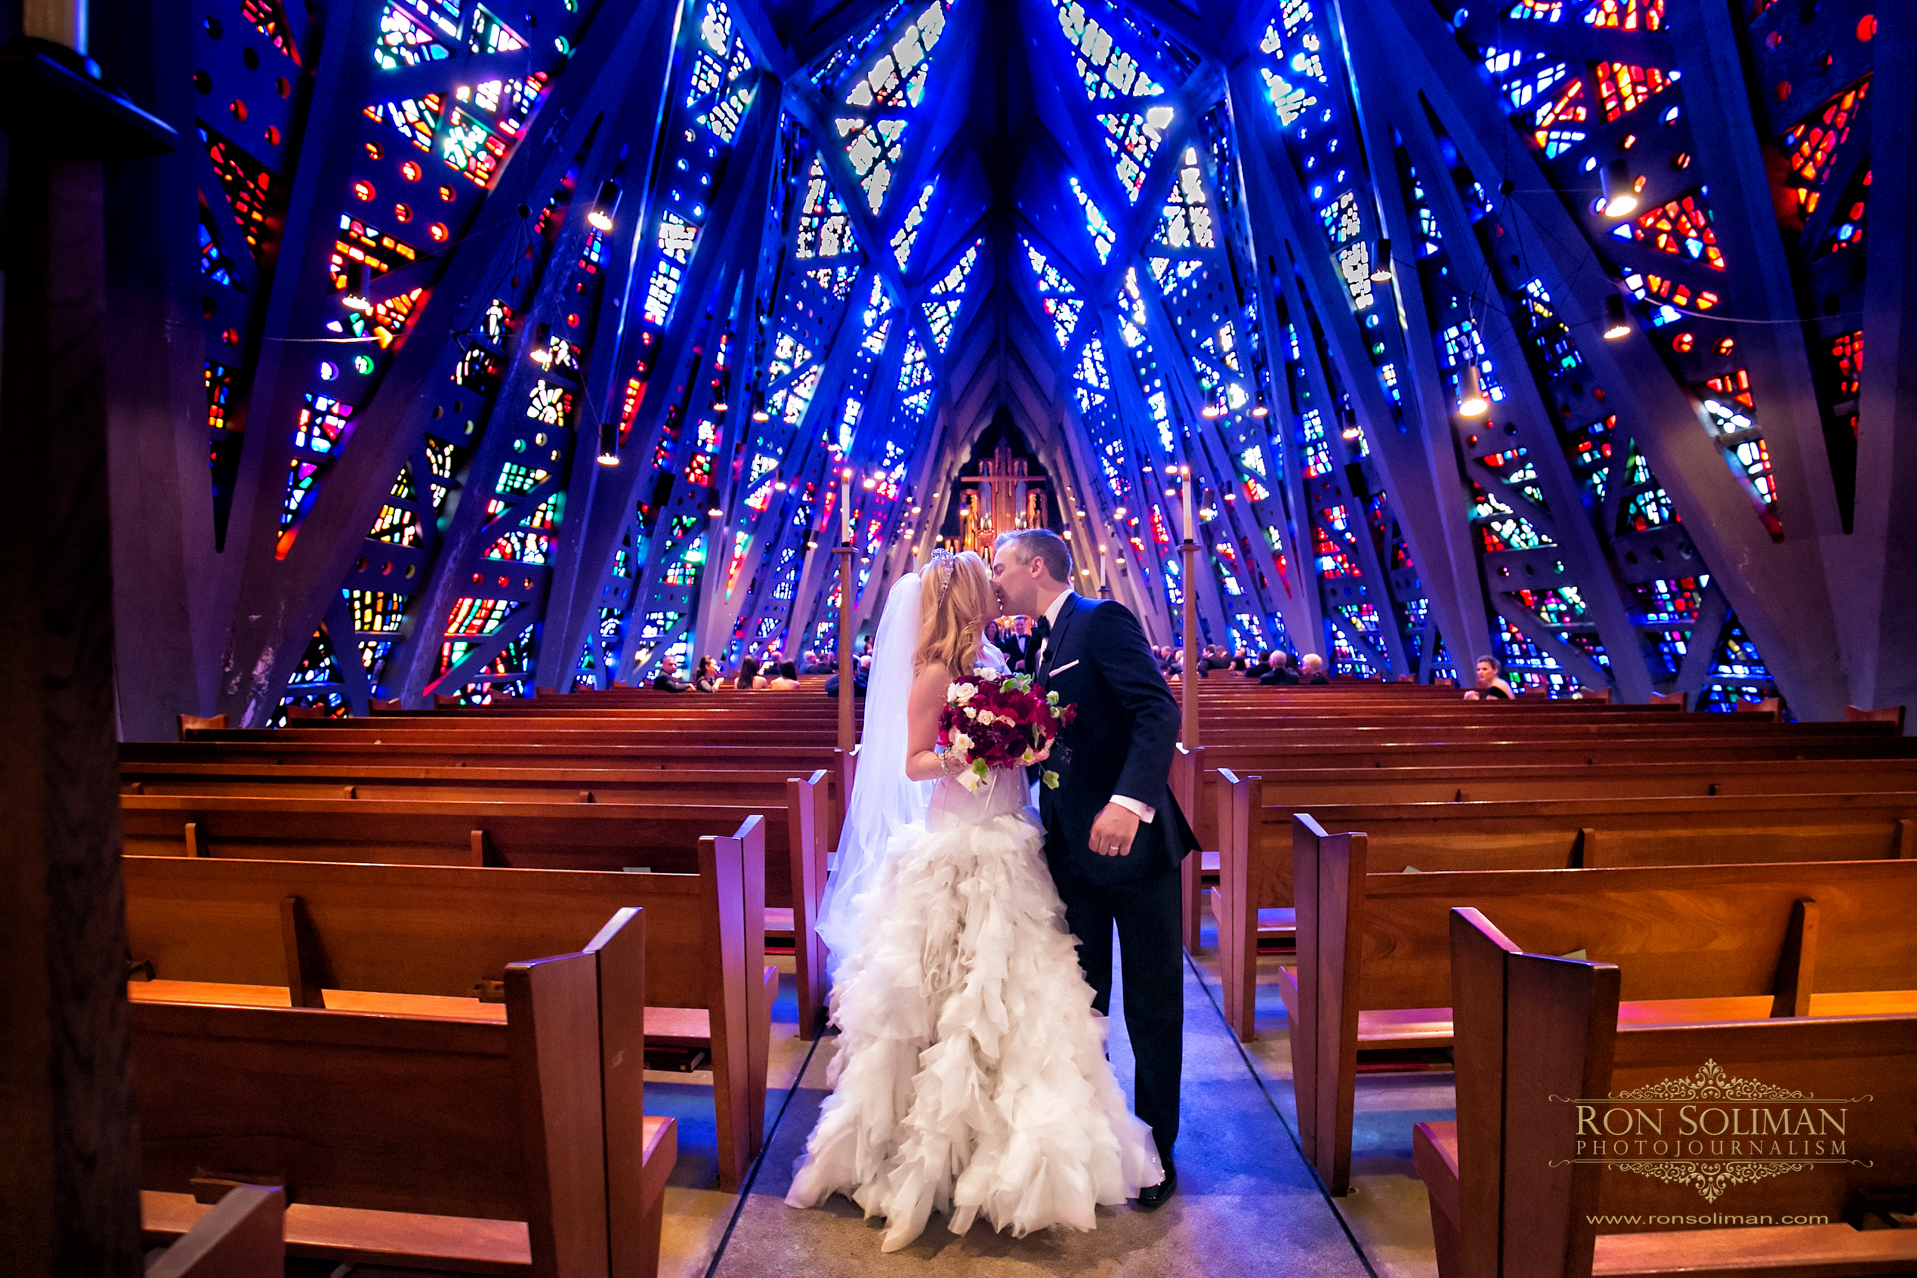 RAINBOW ROOM WEDDING 130